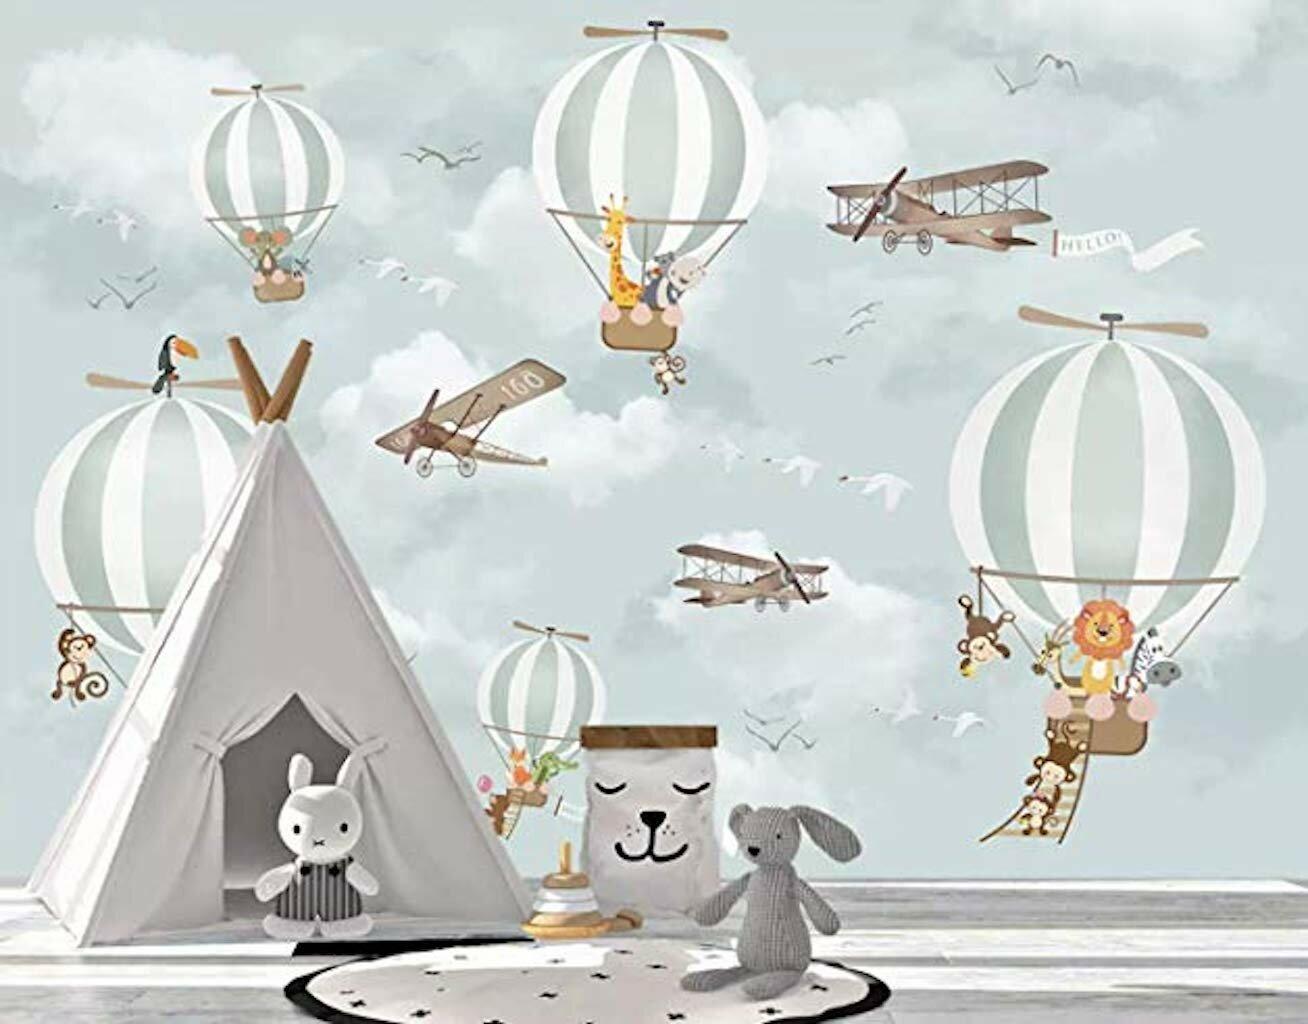 Gk Wall Design Hot Air Balloon Animals And Airplane Textile Wallpaper Wayfair